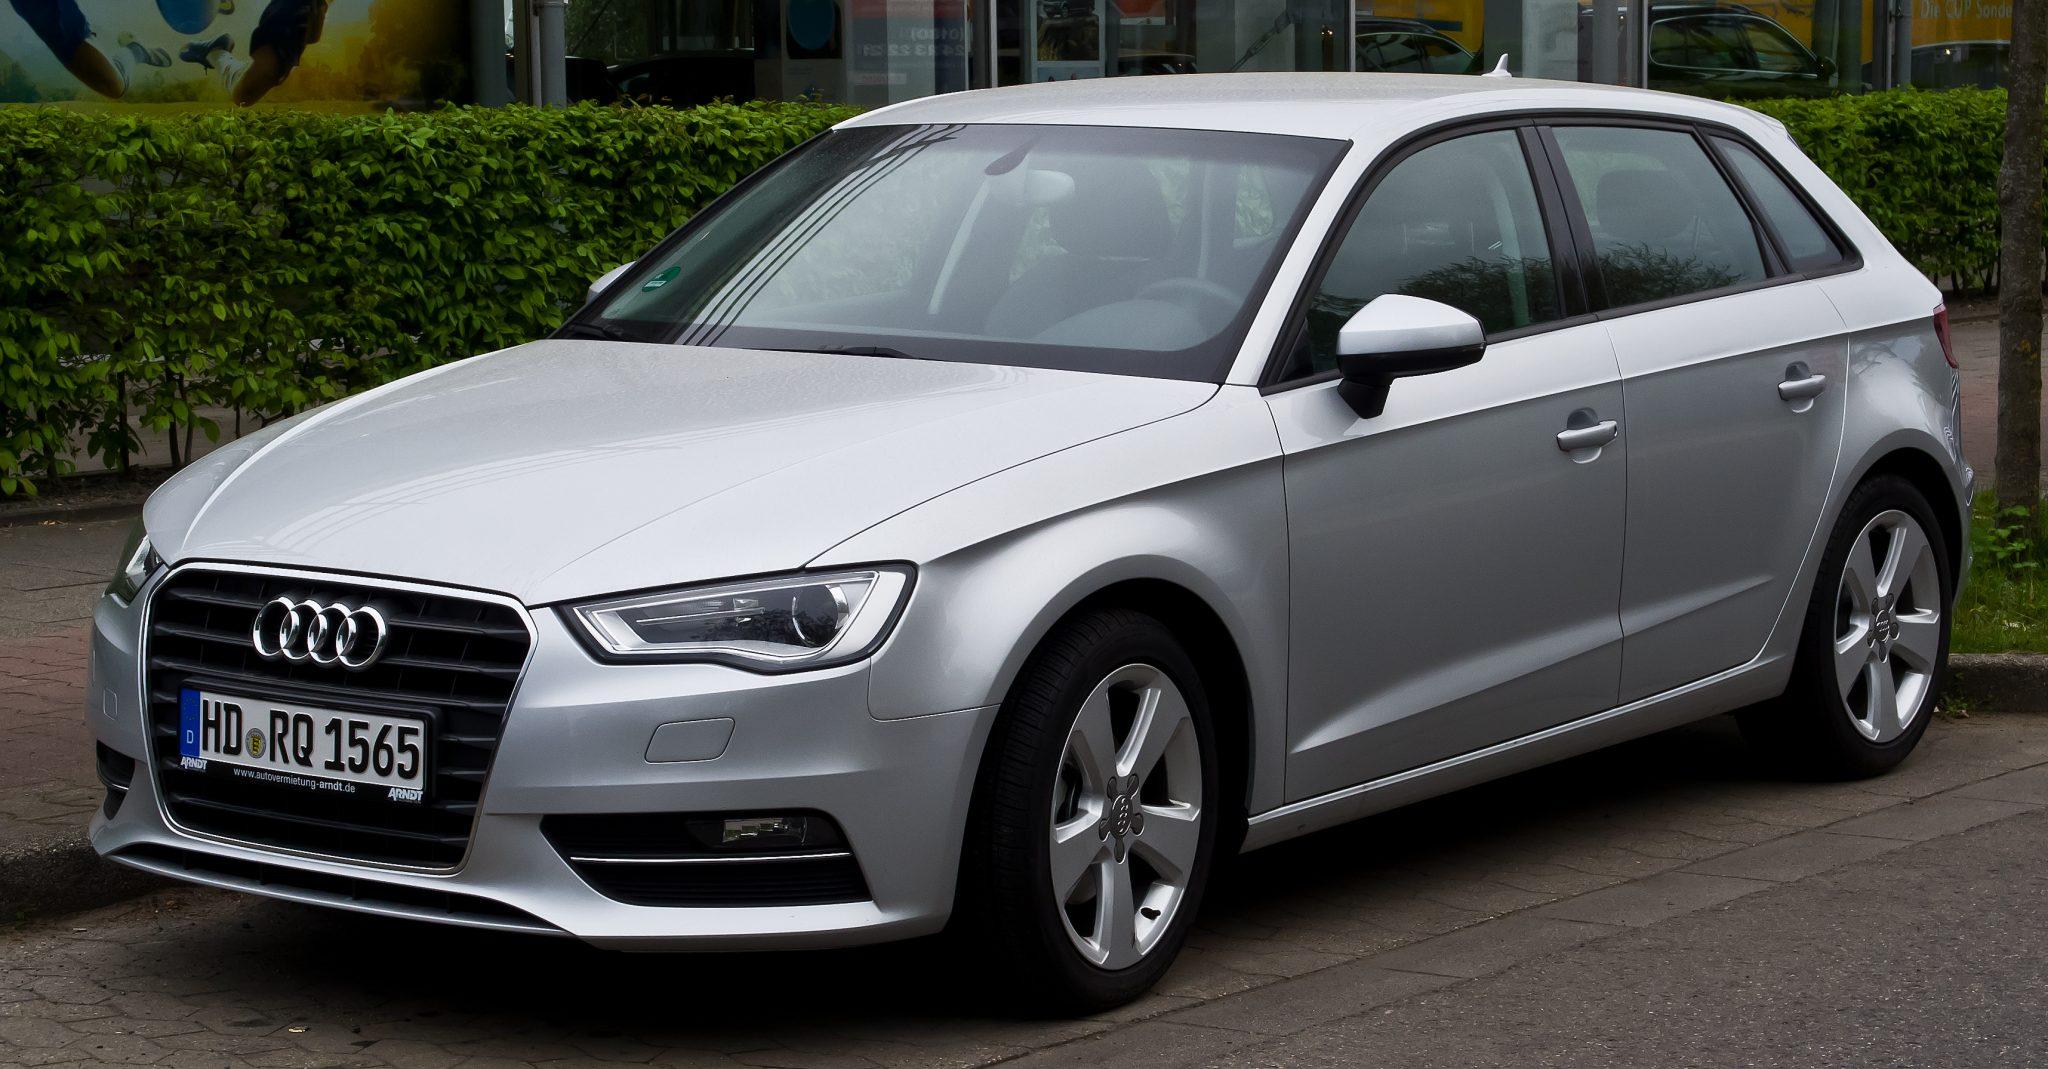 Audi leasing ⇒ Privatleasing og erhvervsleasing leasingportal